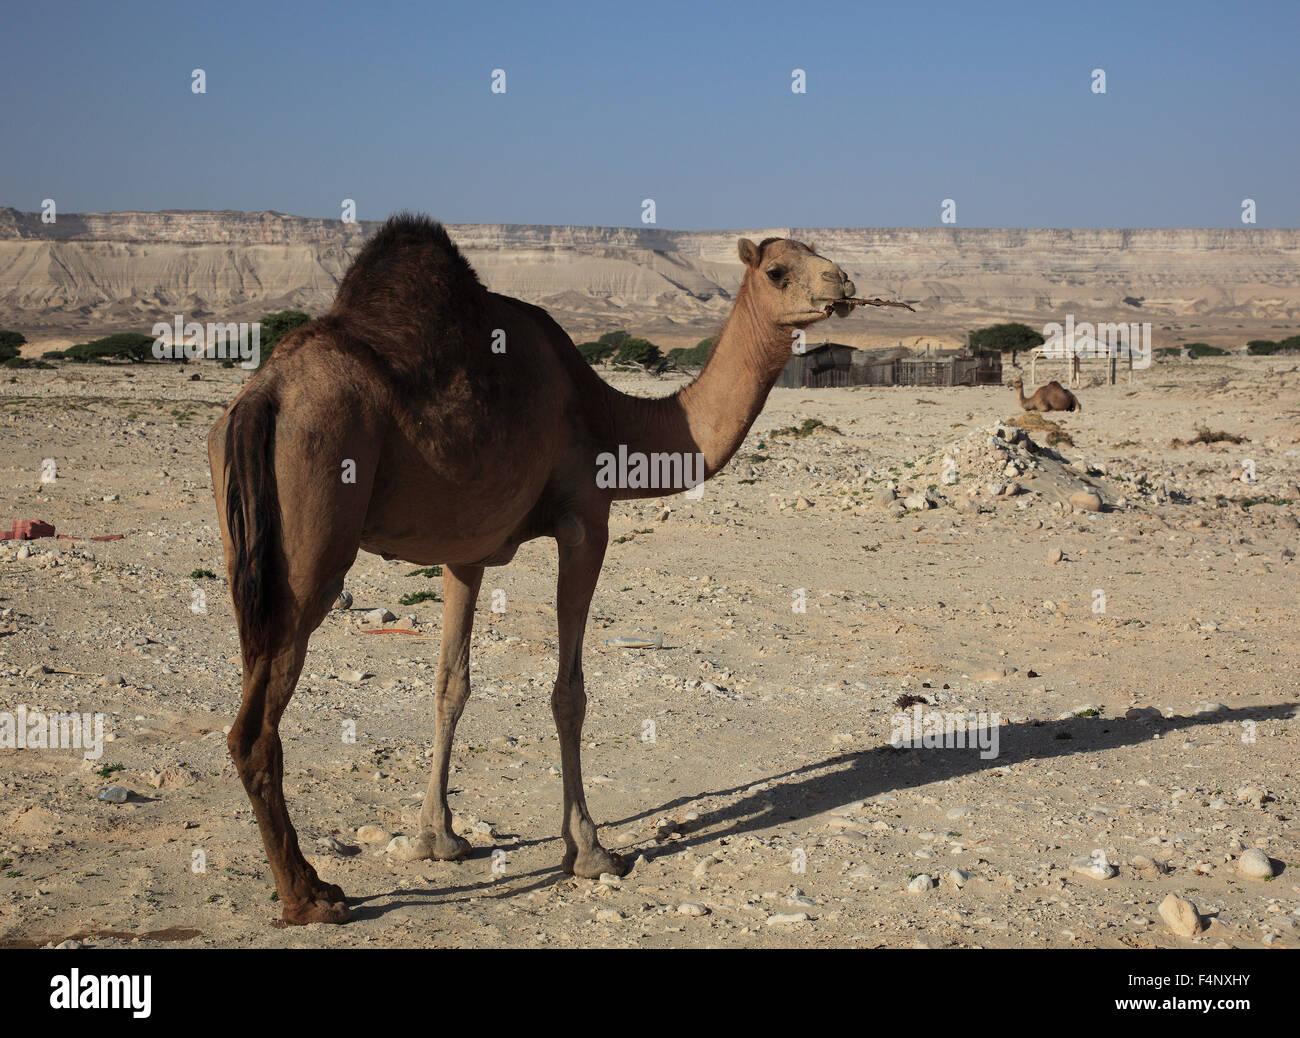 Camel in the desert, Oman Stock Photo